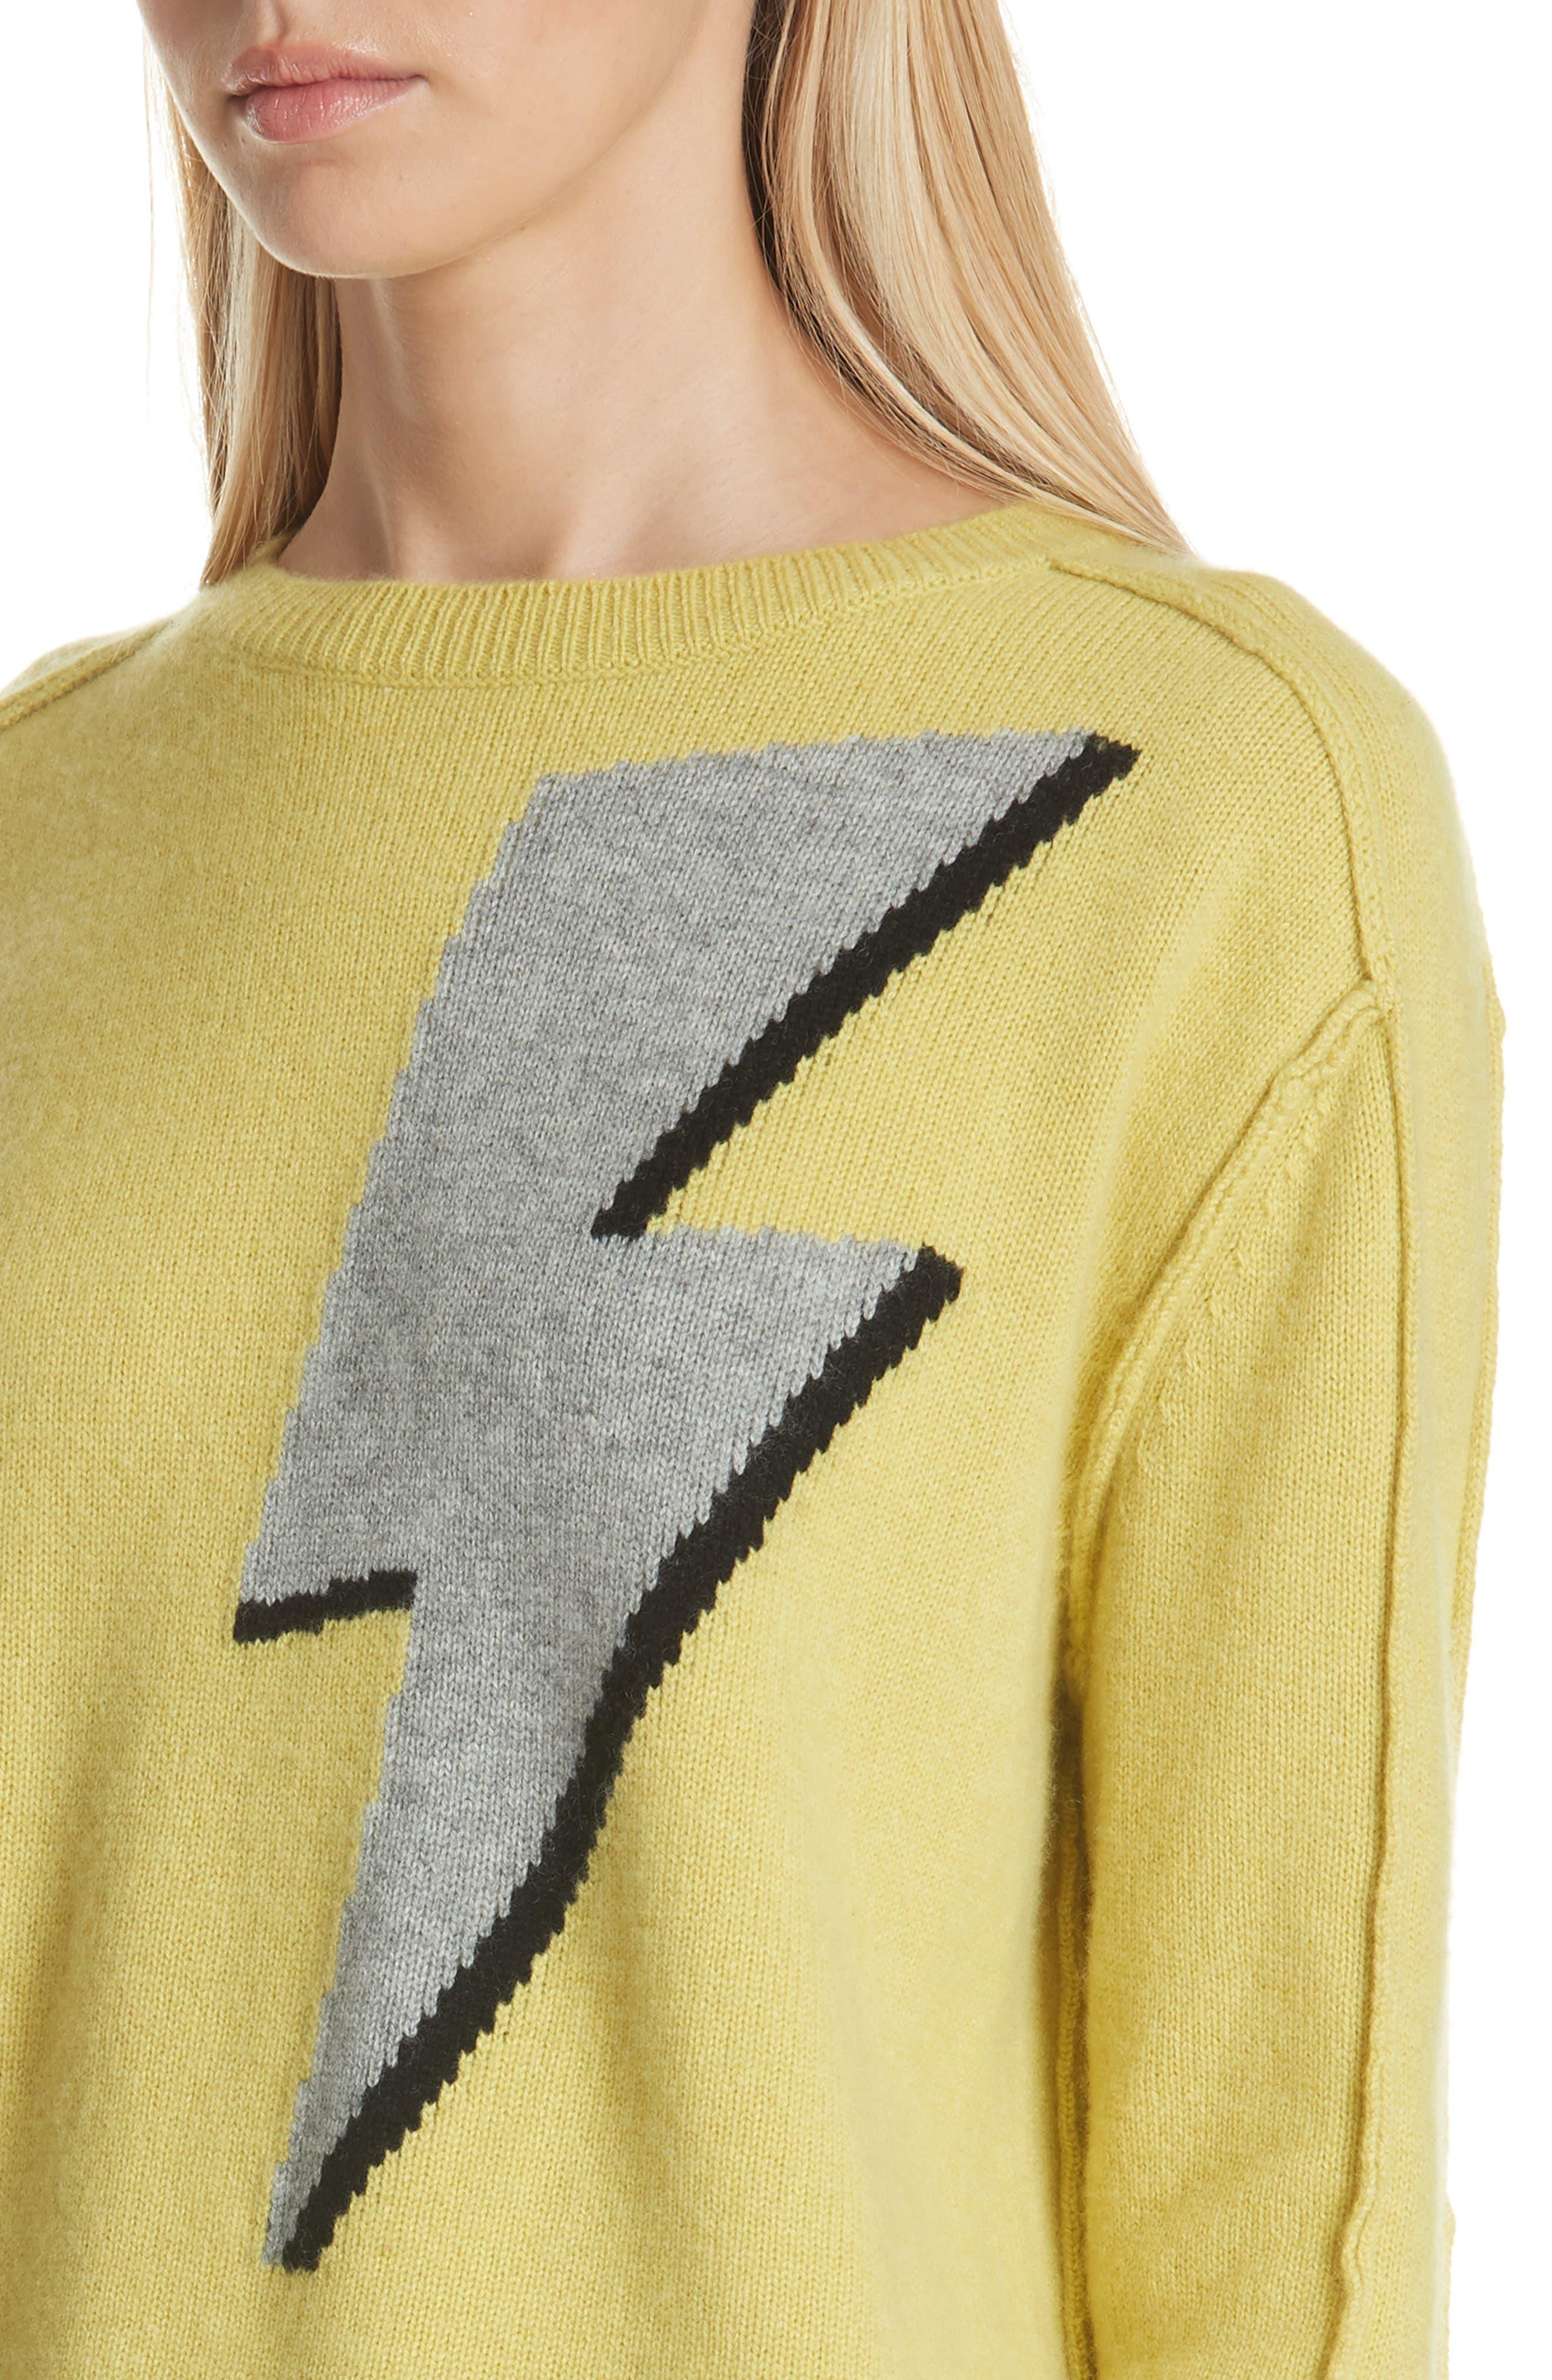 Lightning Bolt Wool & Cashmere Sweater,                             Alternate thumbnail 4, color,                             720